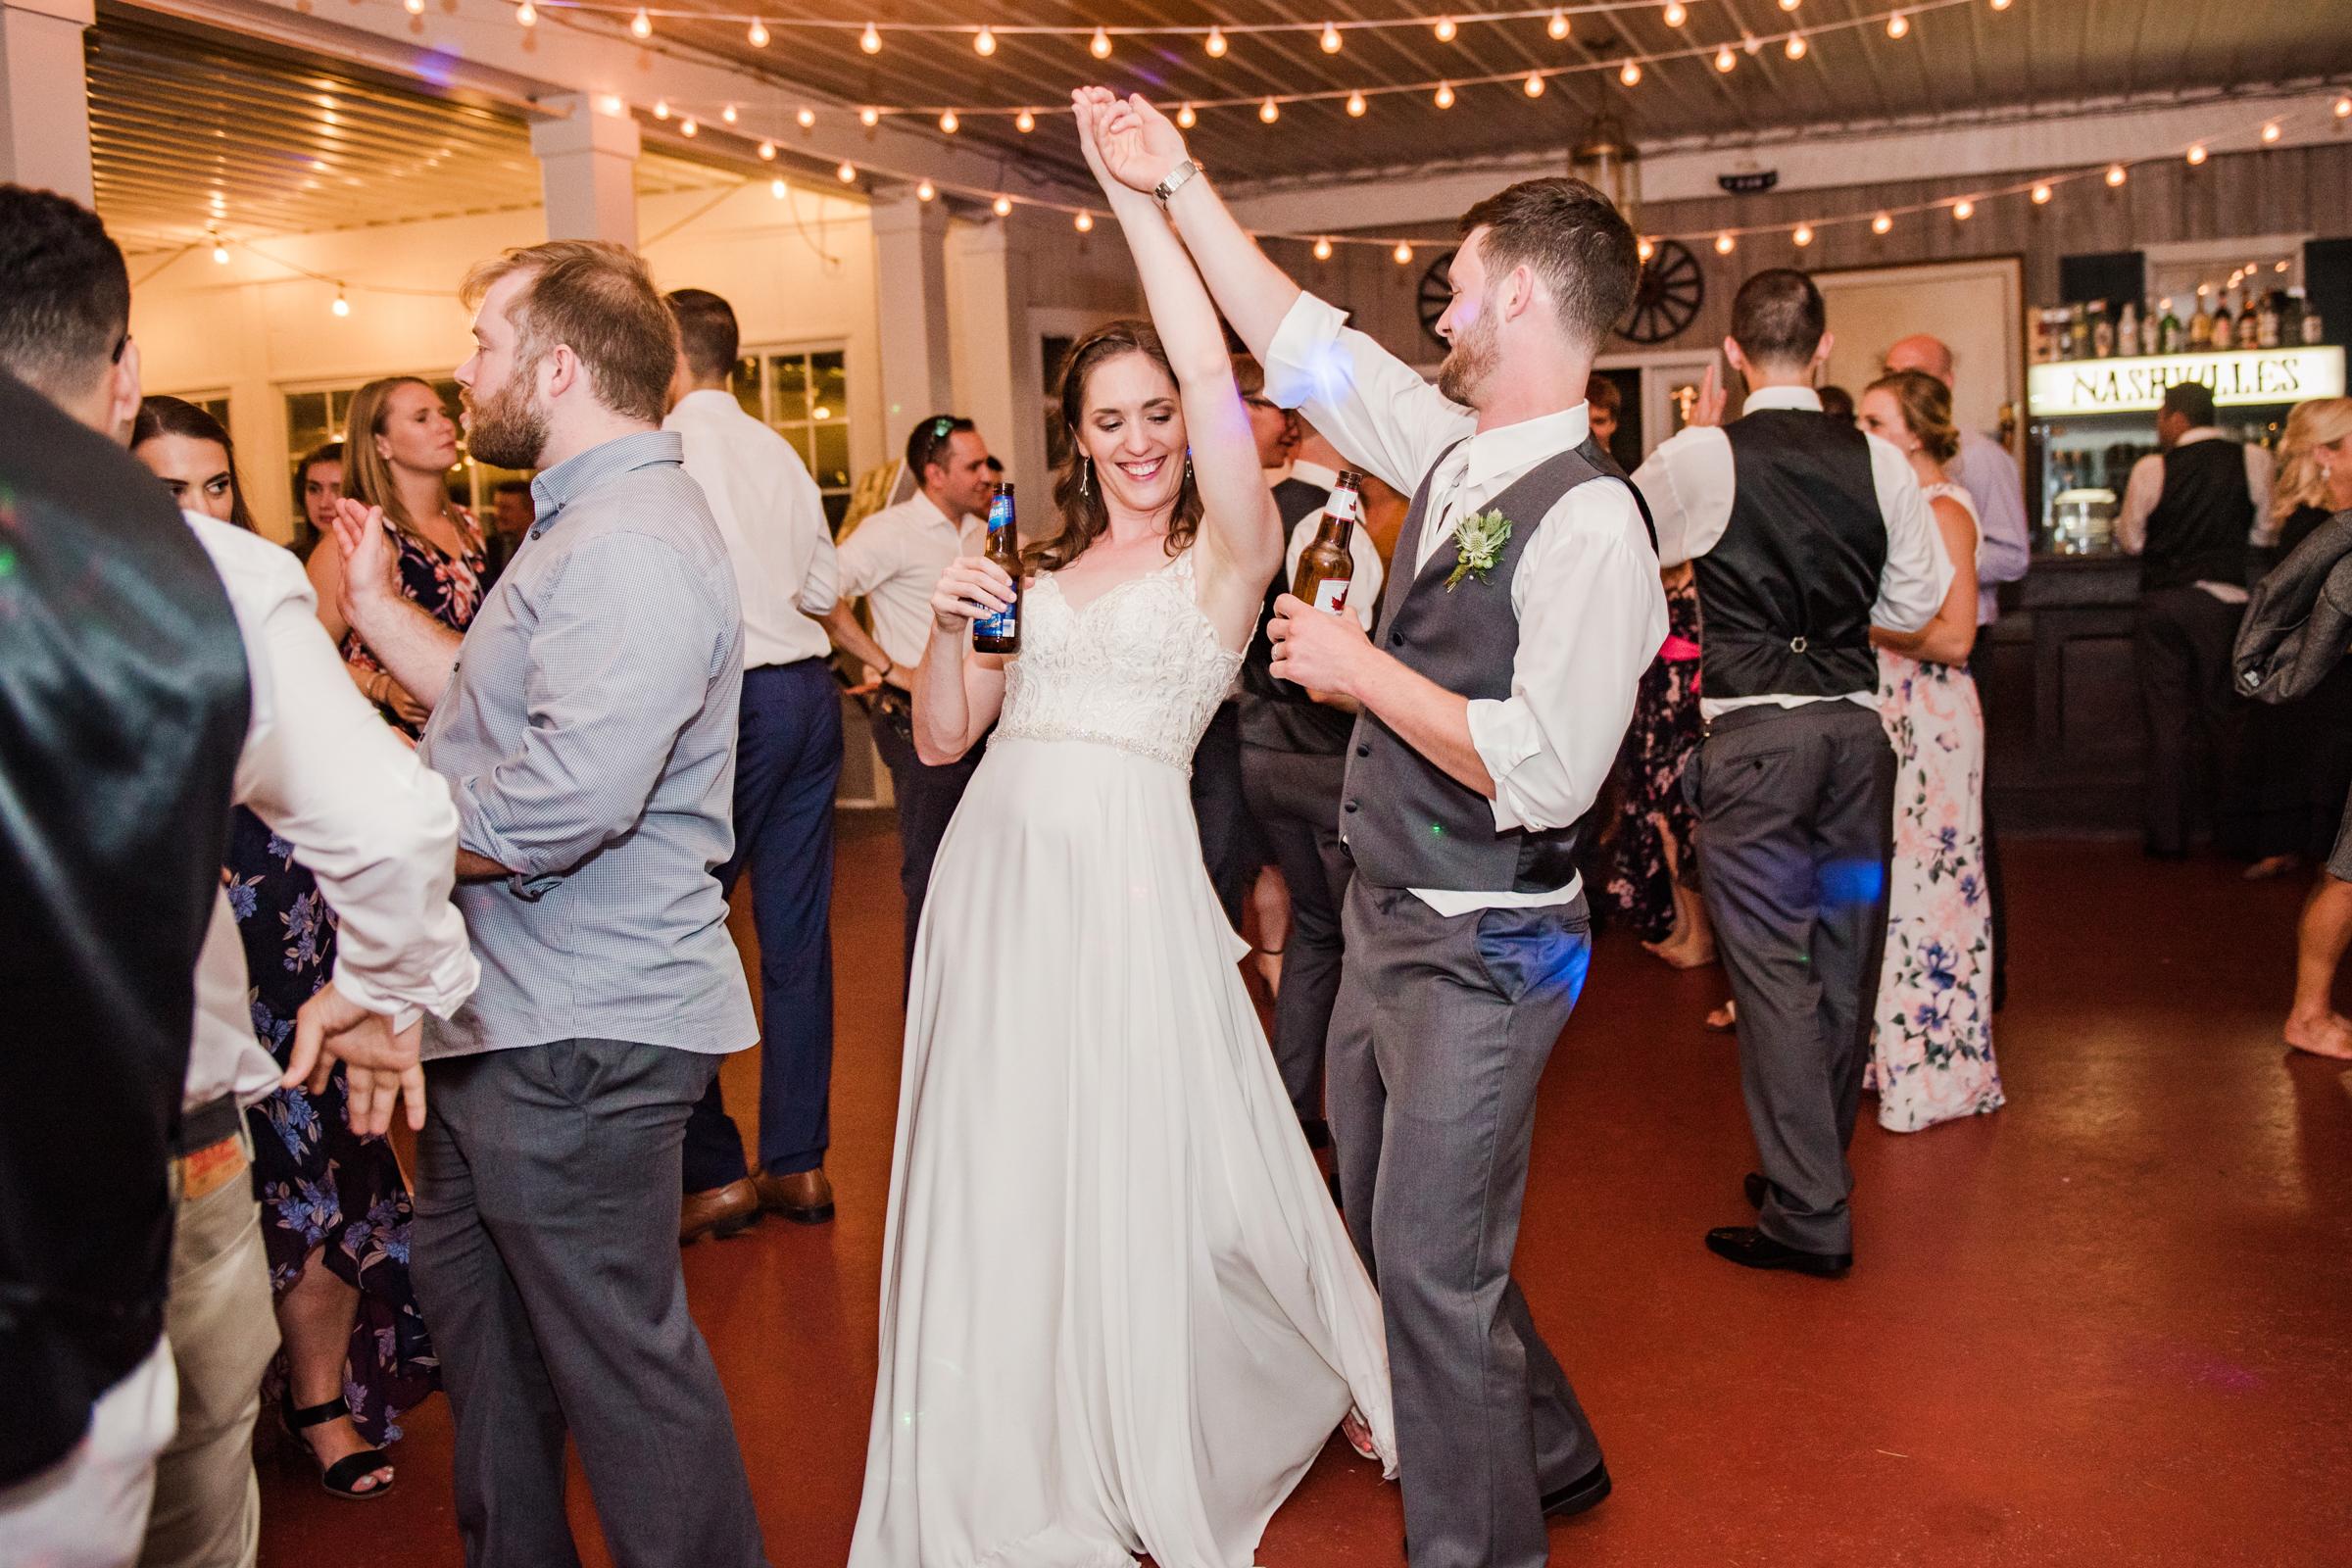 Jerris_Wadsworth_Wedding_Barn_Rochester_Wedding_JILL_STUDIO_Rochester_NY_Photographer_DSC_3245.jpg